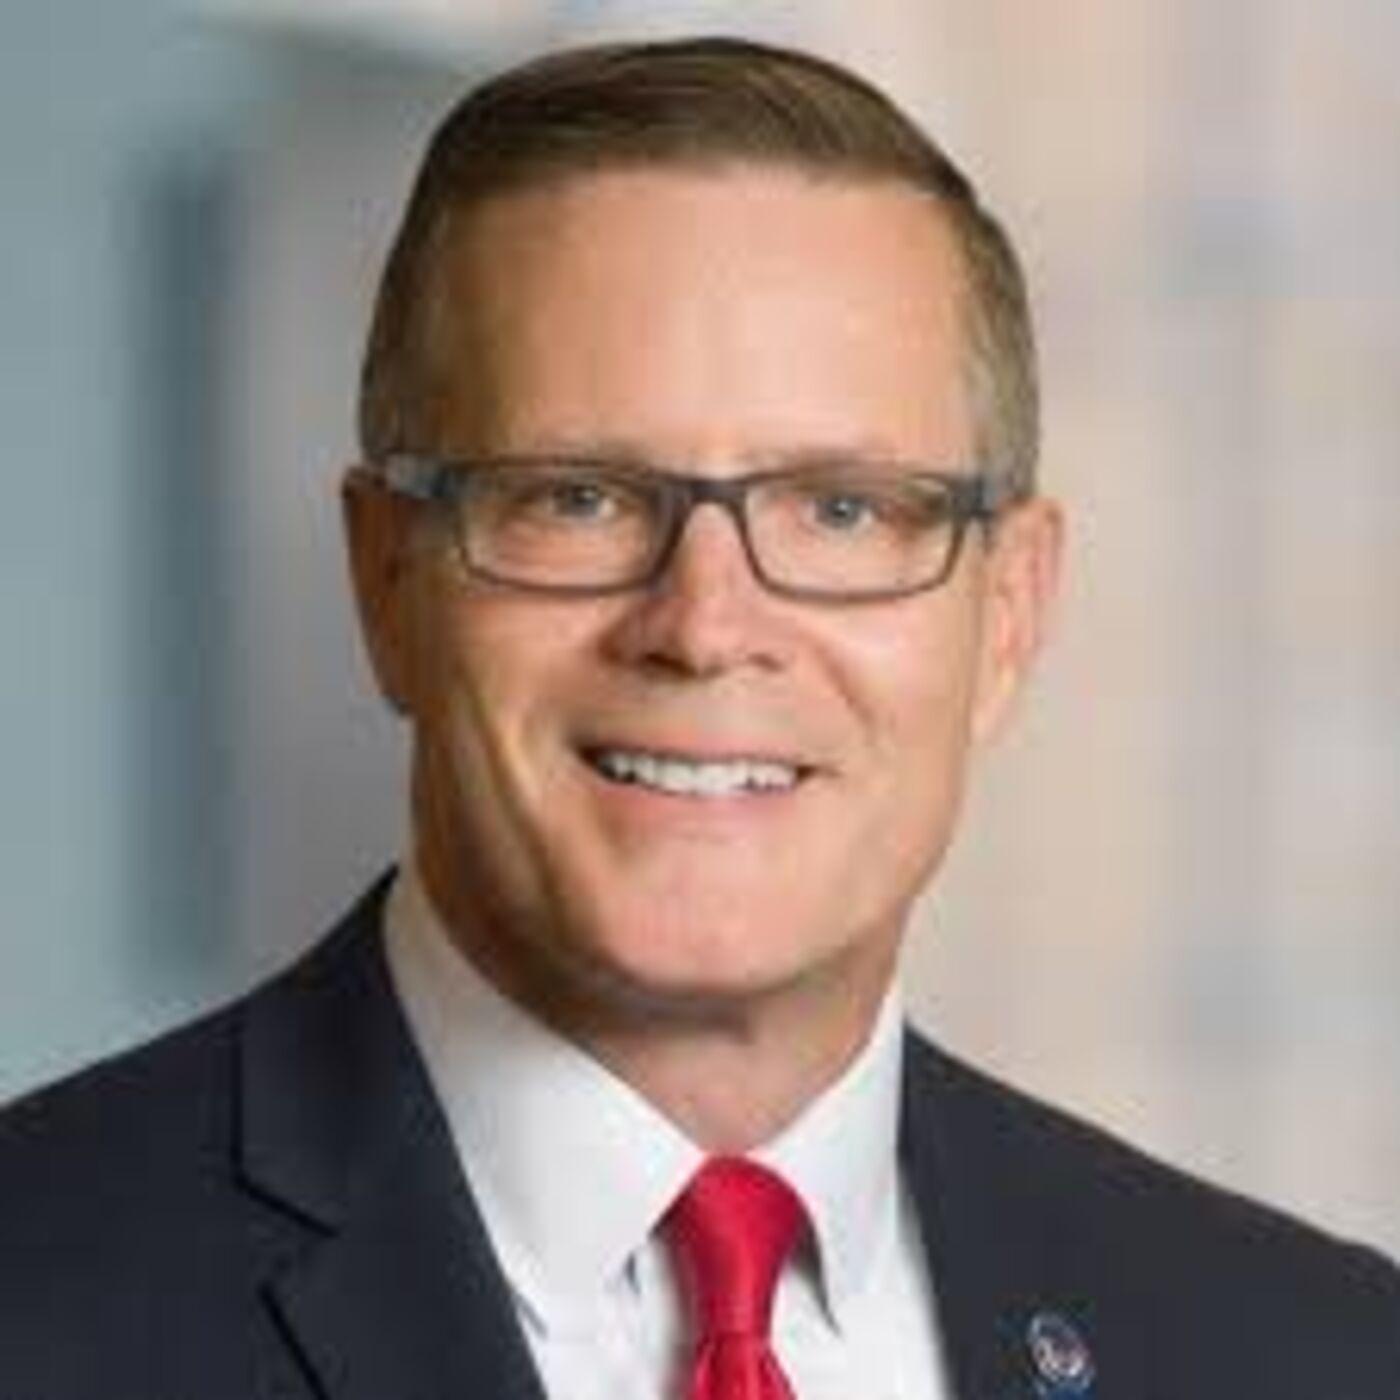 #18 - Cleveland City Council President, Kevin Kelley